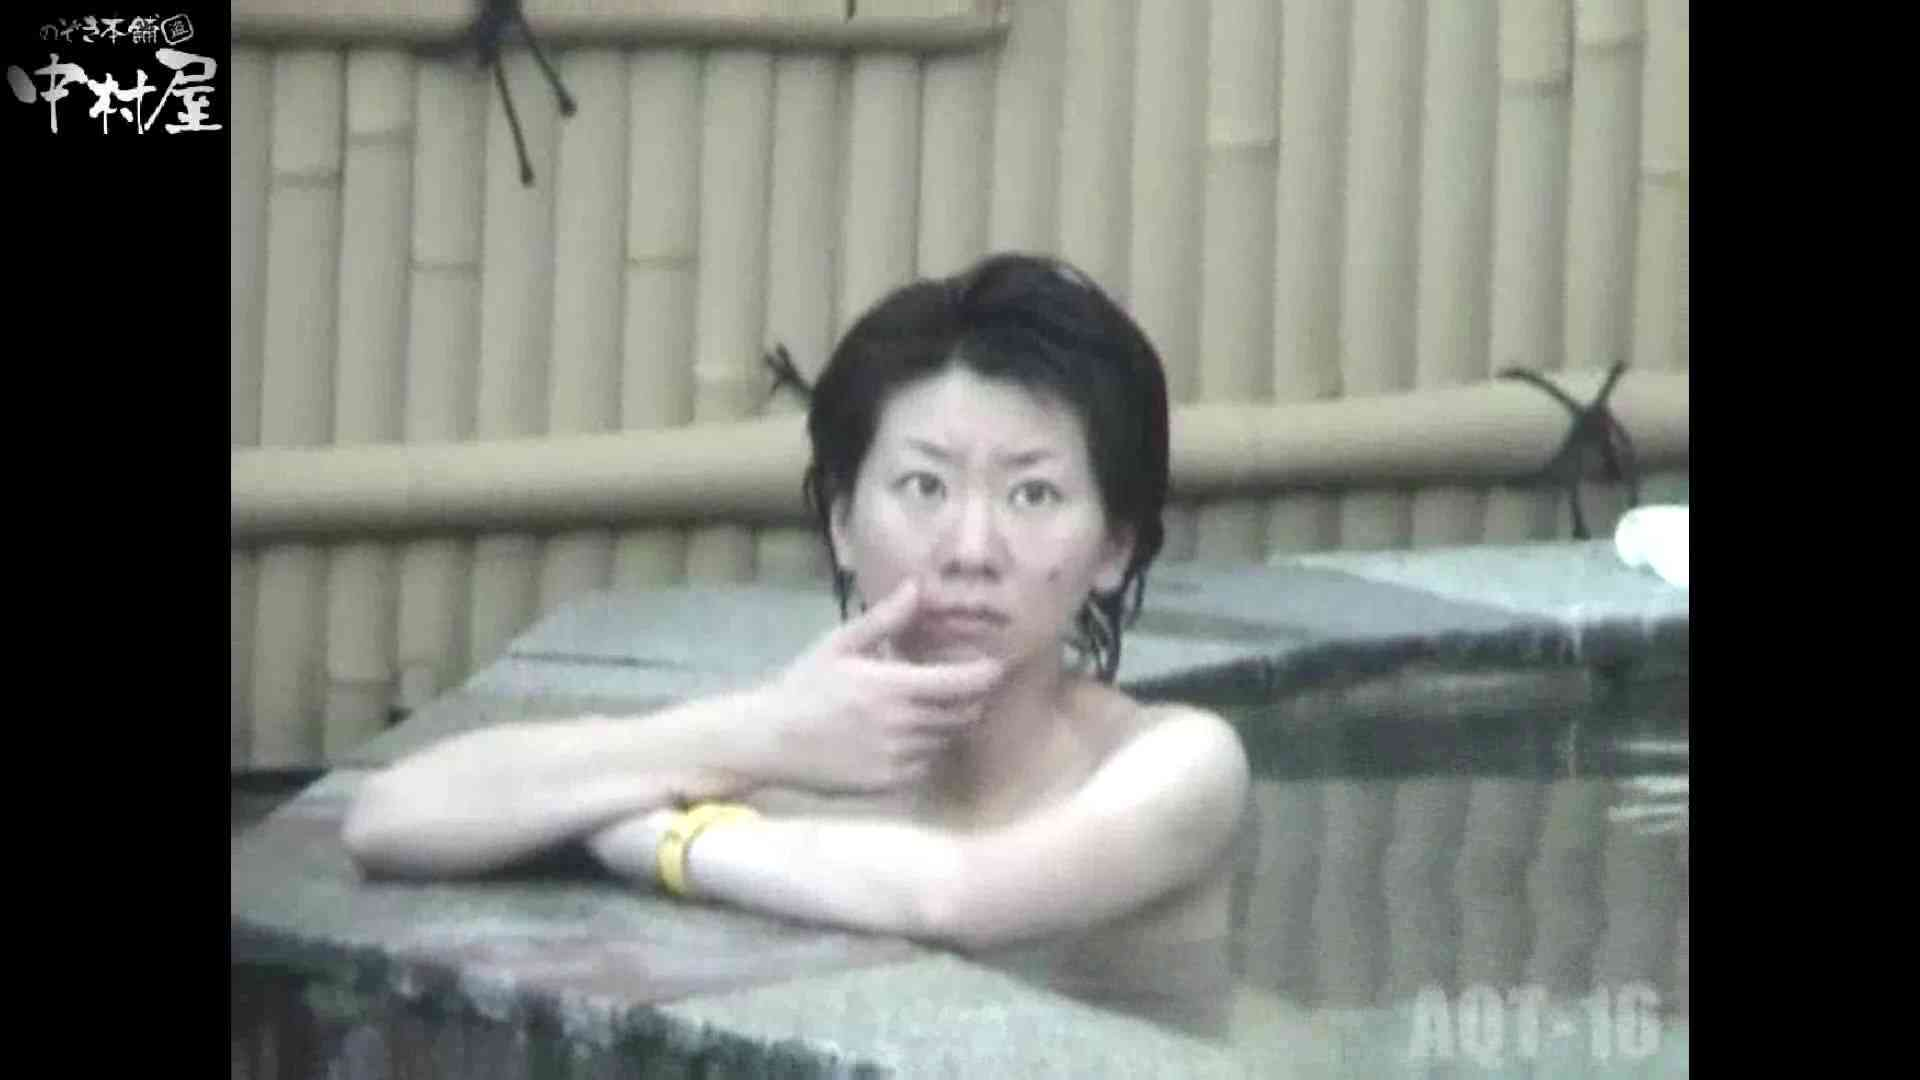 Aquaな露天風呂Vol.880潜入盗撮露天風呂十六判湯 其の三 盗撮師作品  100pic 8